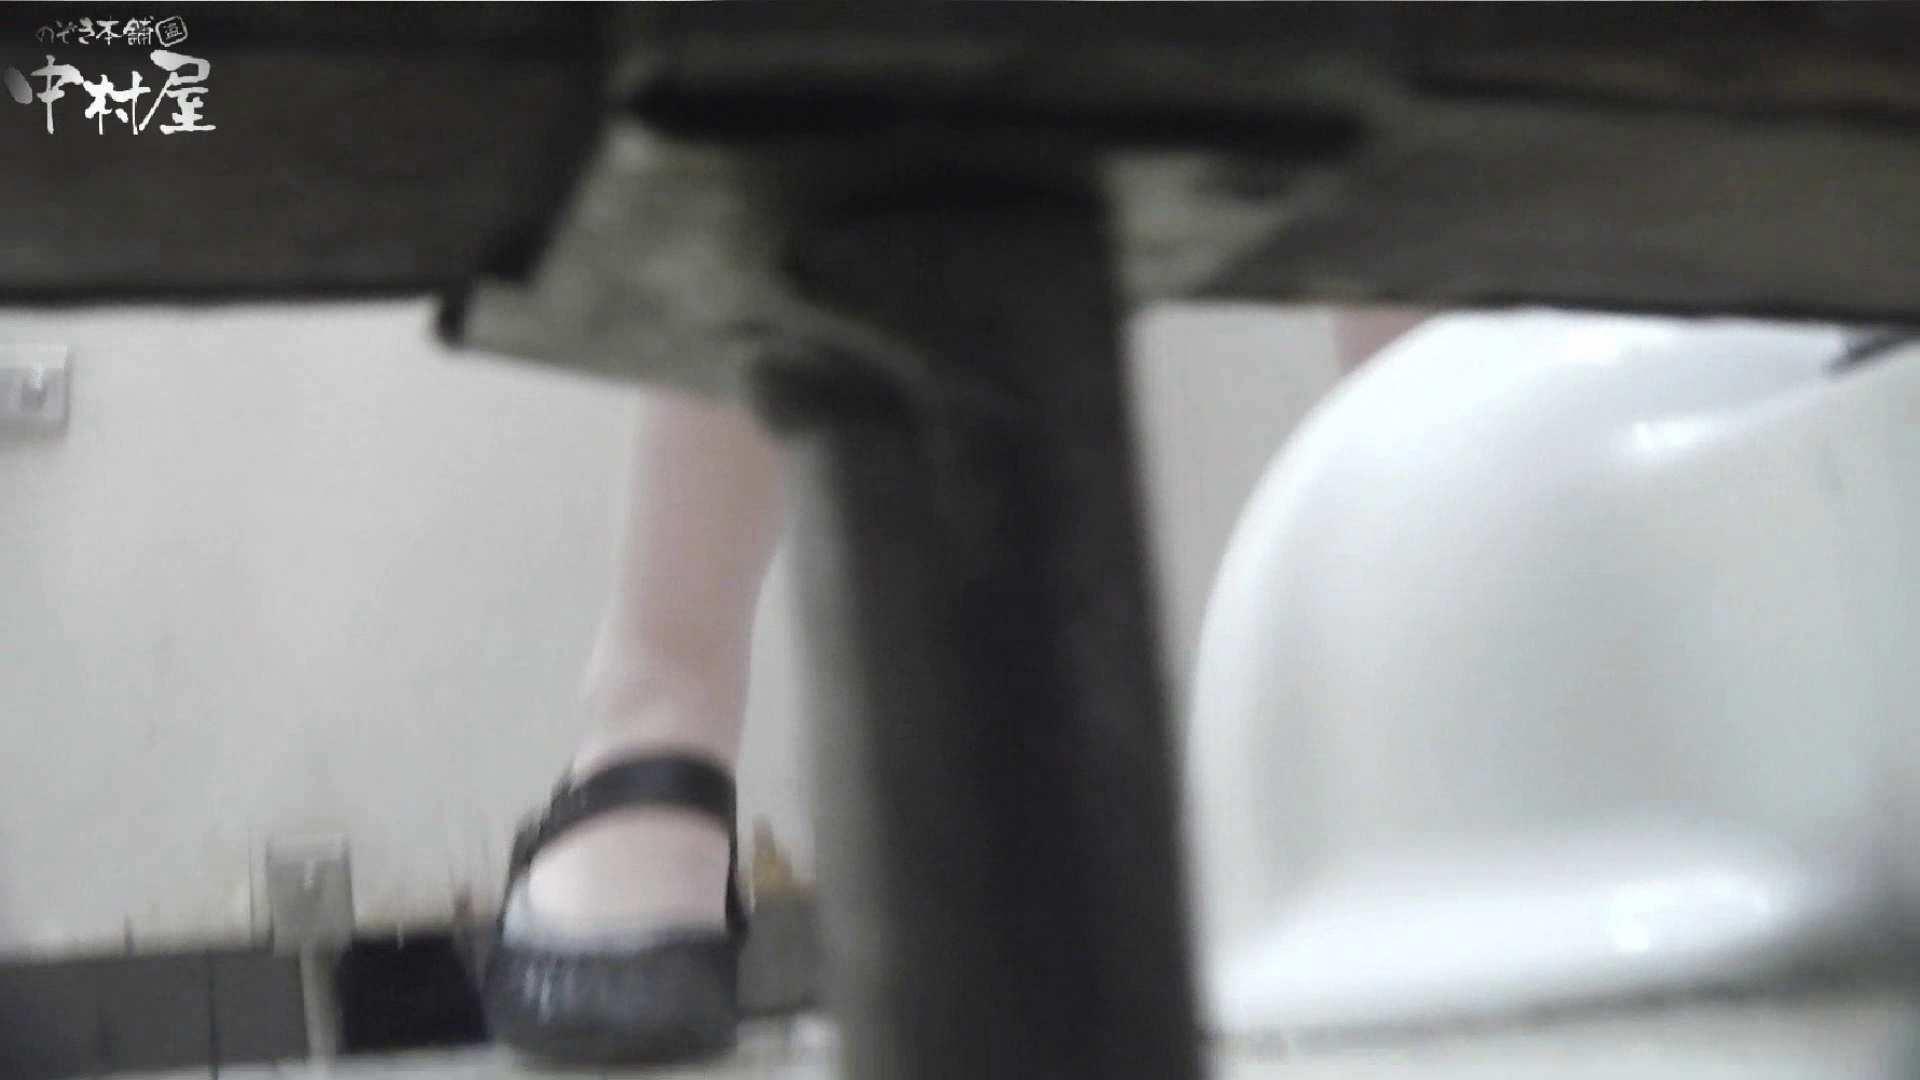 vol.41 命がけ潜伏洗面所! 毛薄め・硬度並・推定250g 潜入 隠し撮りオマンコ動画紹介 89PICs 27